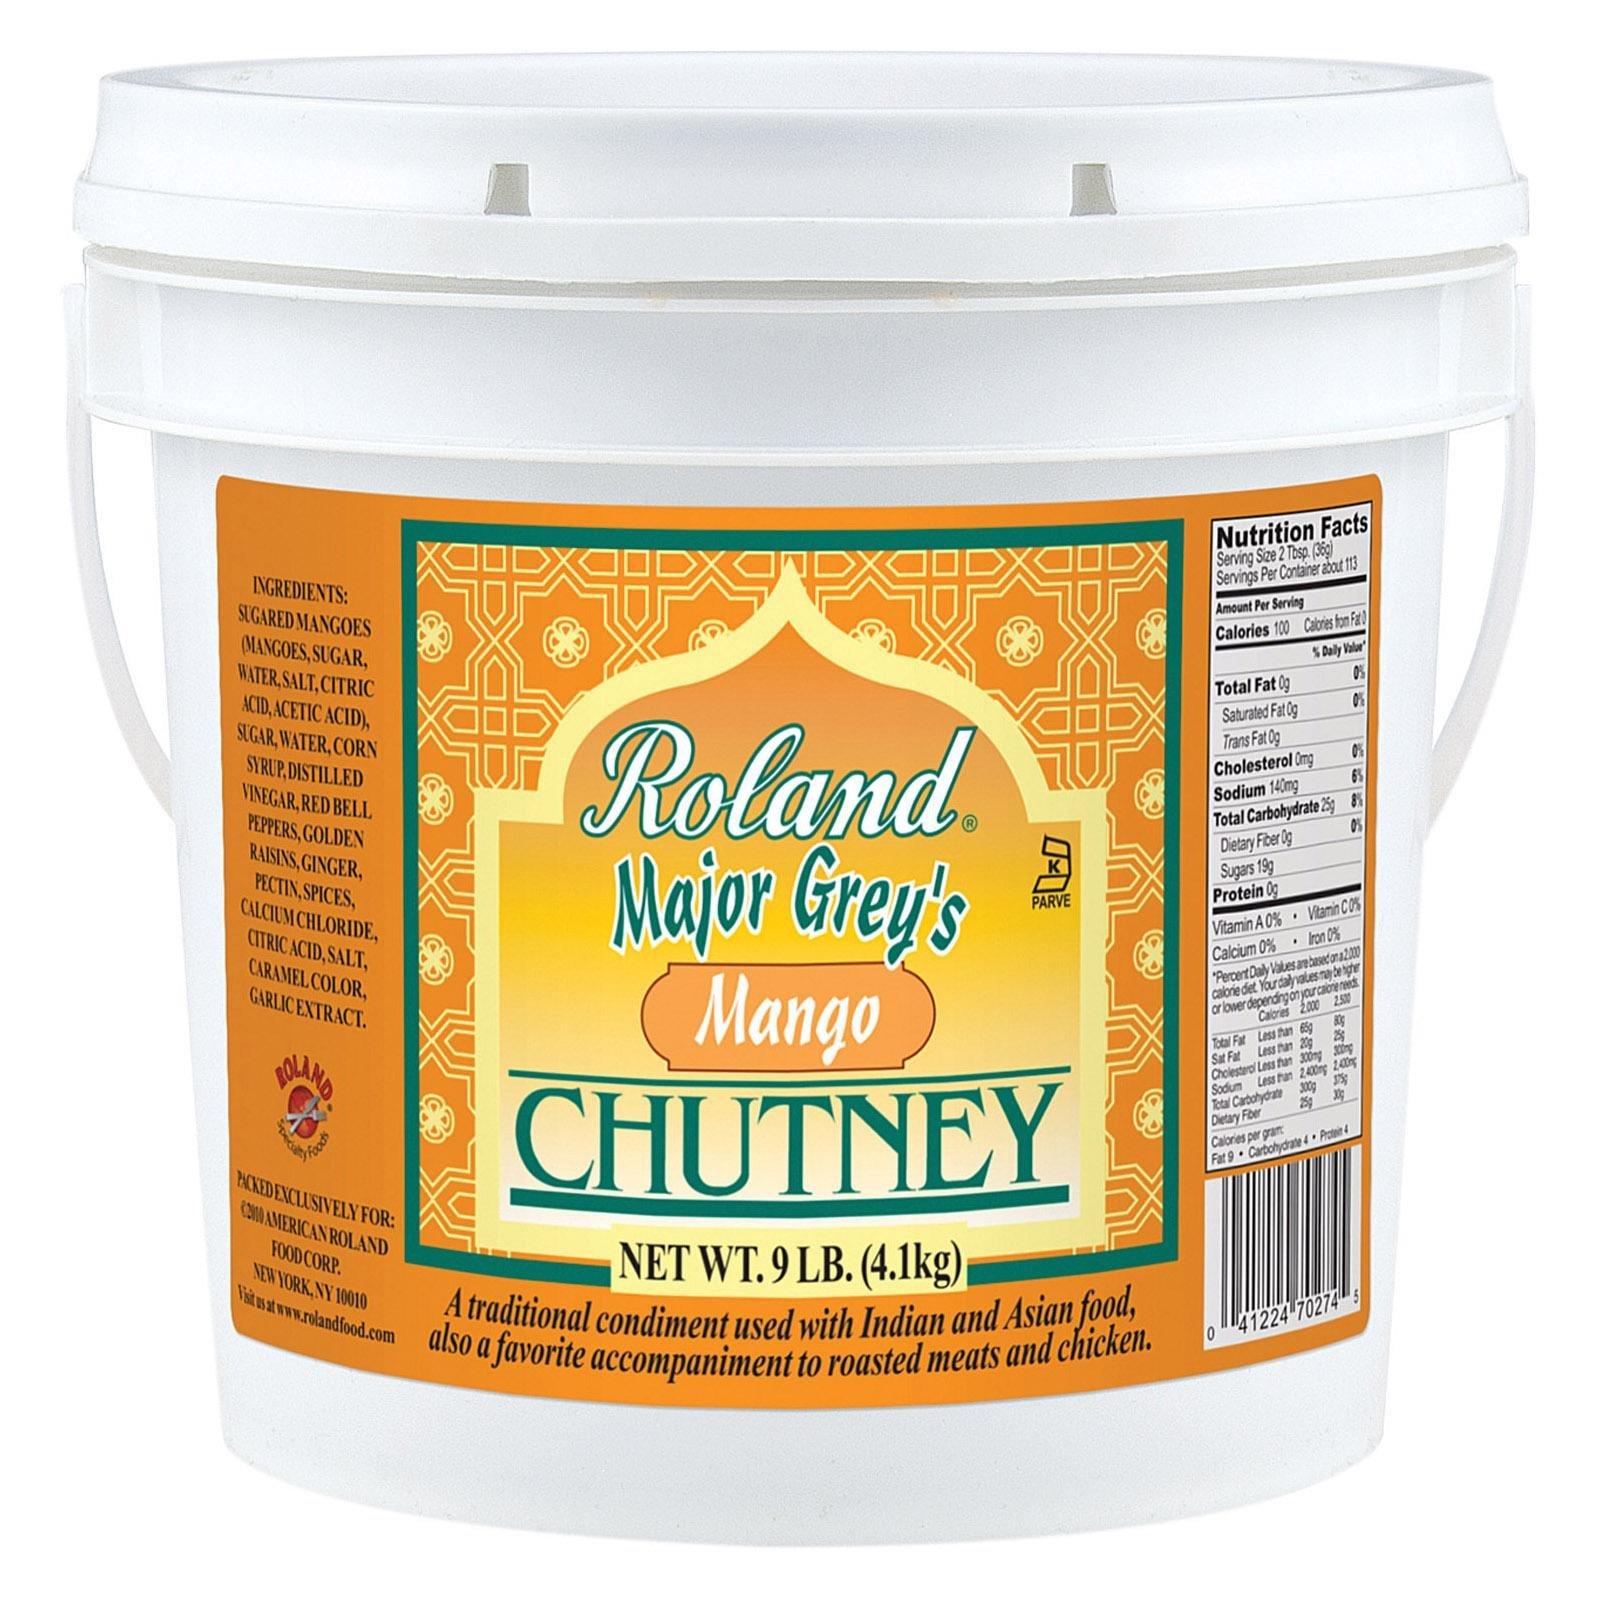 Roland: Major Grey's Mango Chutney 1 Gal (4 Pack) by Roland